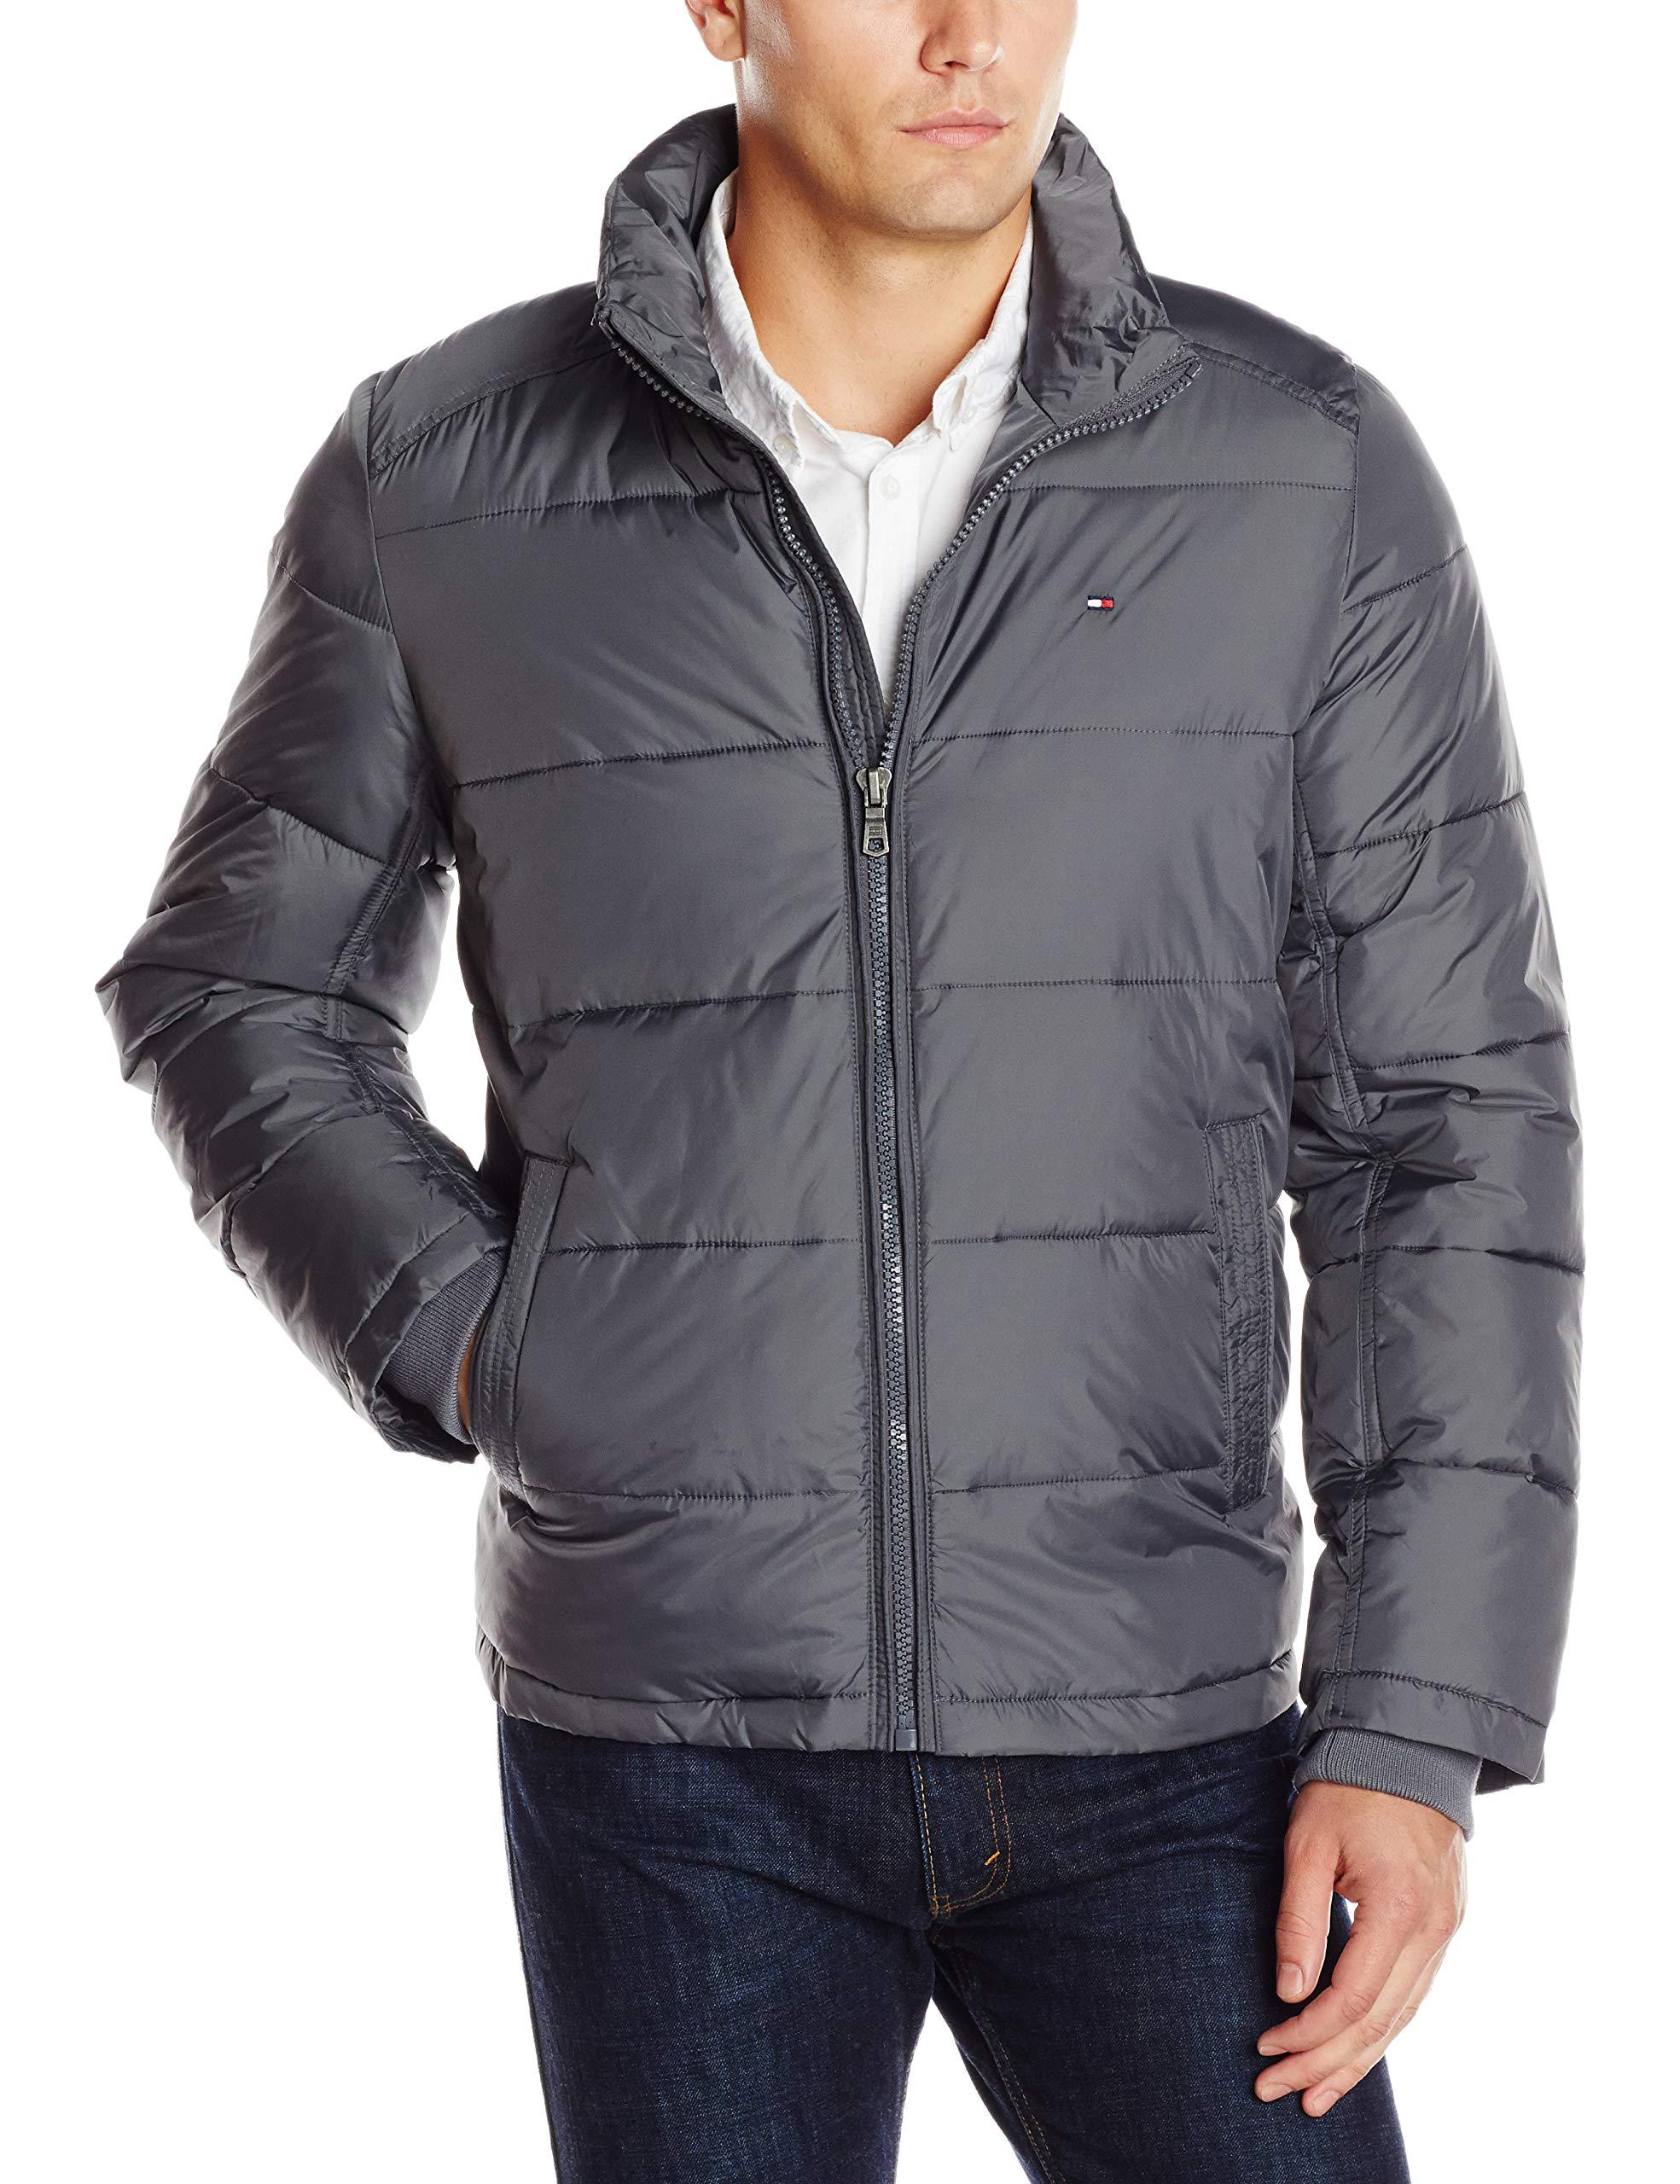 Tommy Hilfiger mens Classic Puffer Jacket (Standard and Big & Tall)